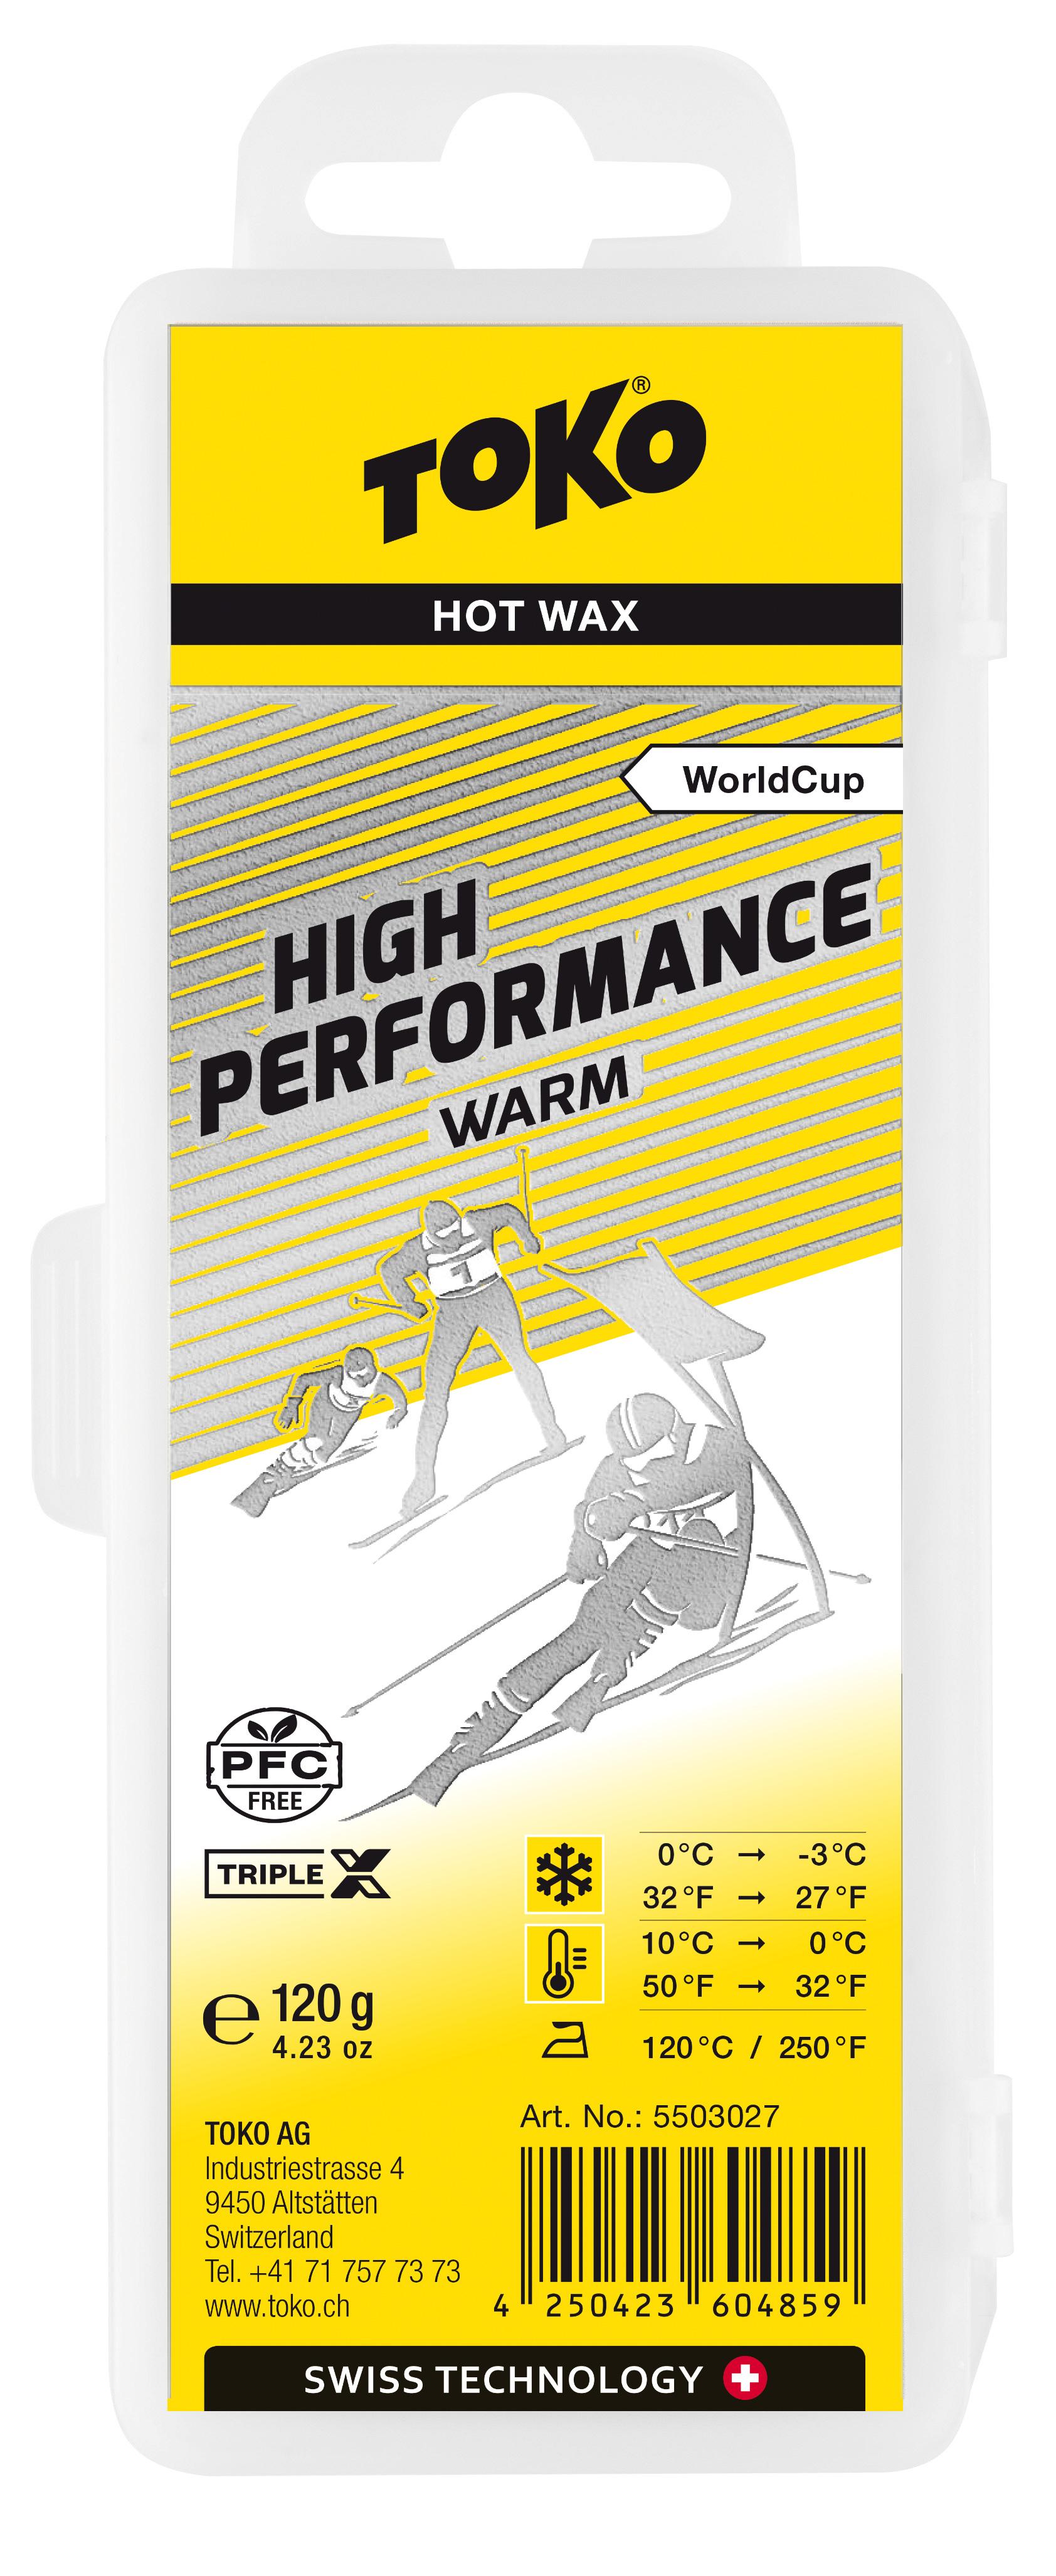 TOKO WC High Performance Warm 120g